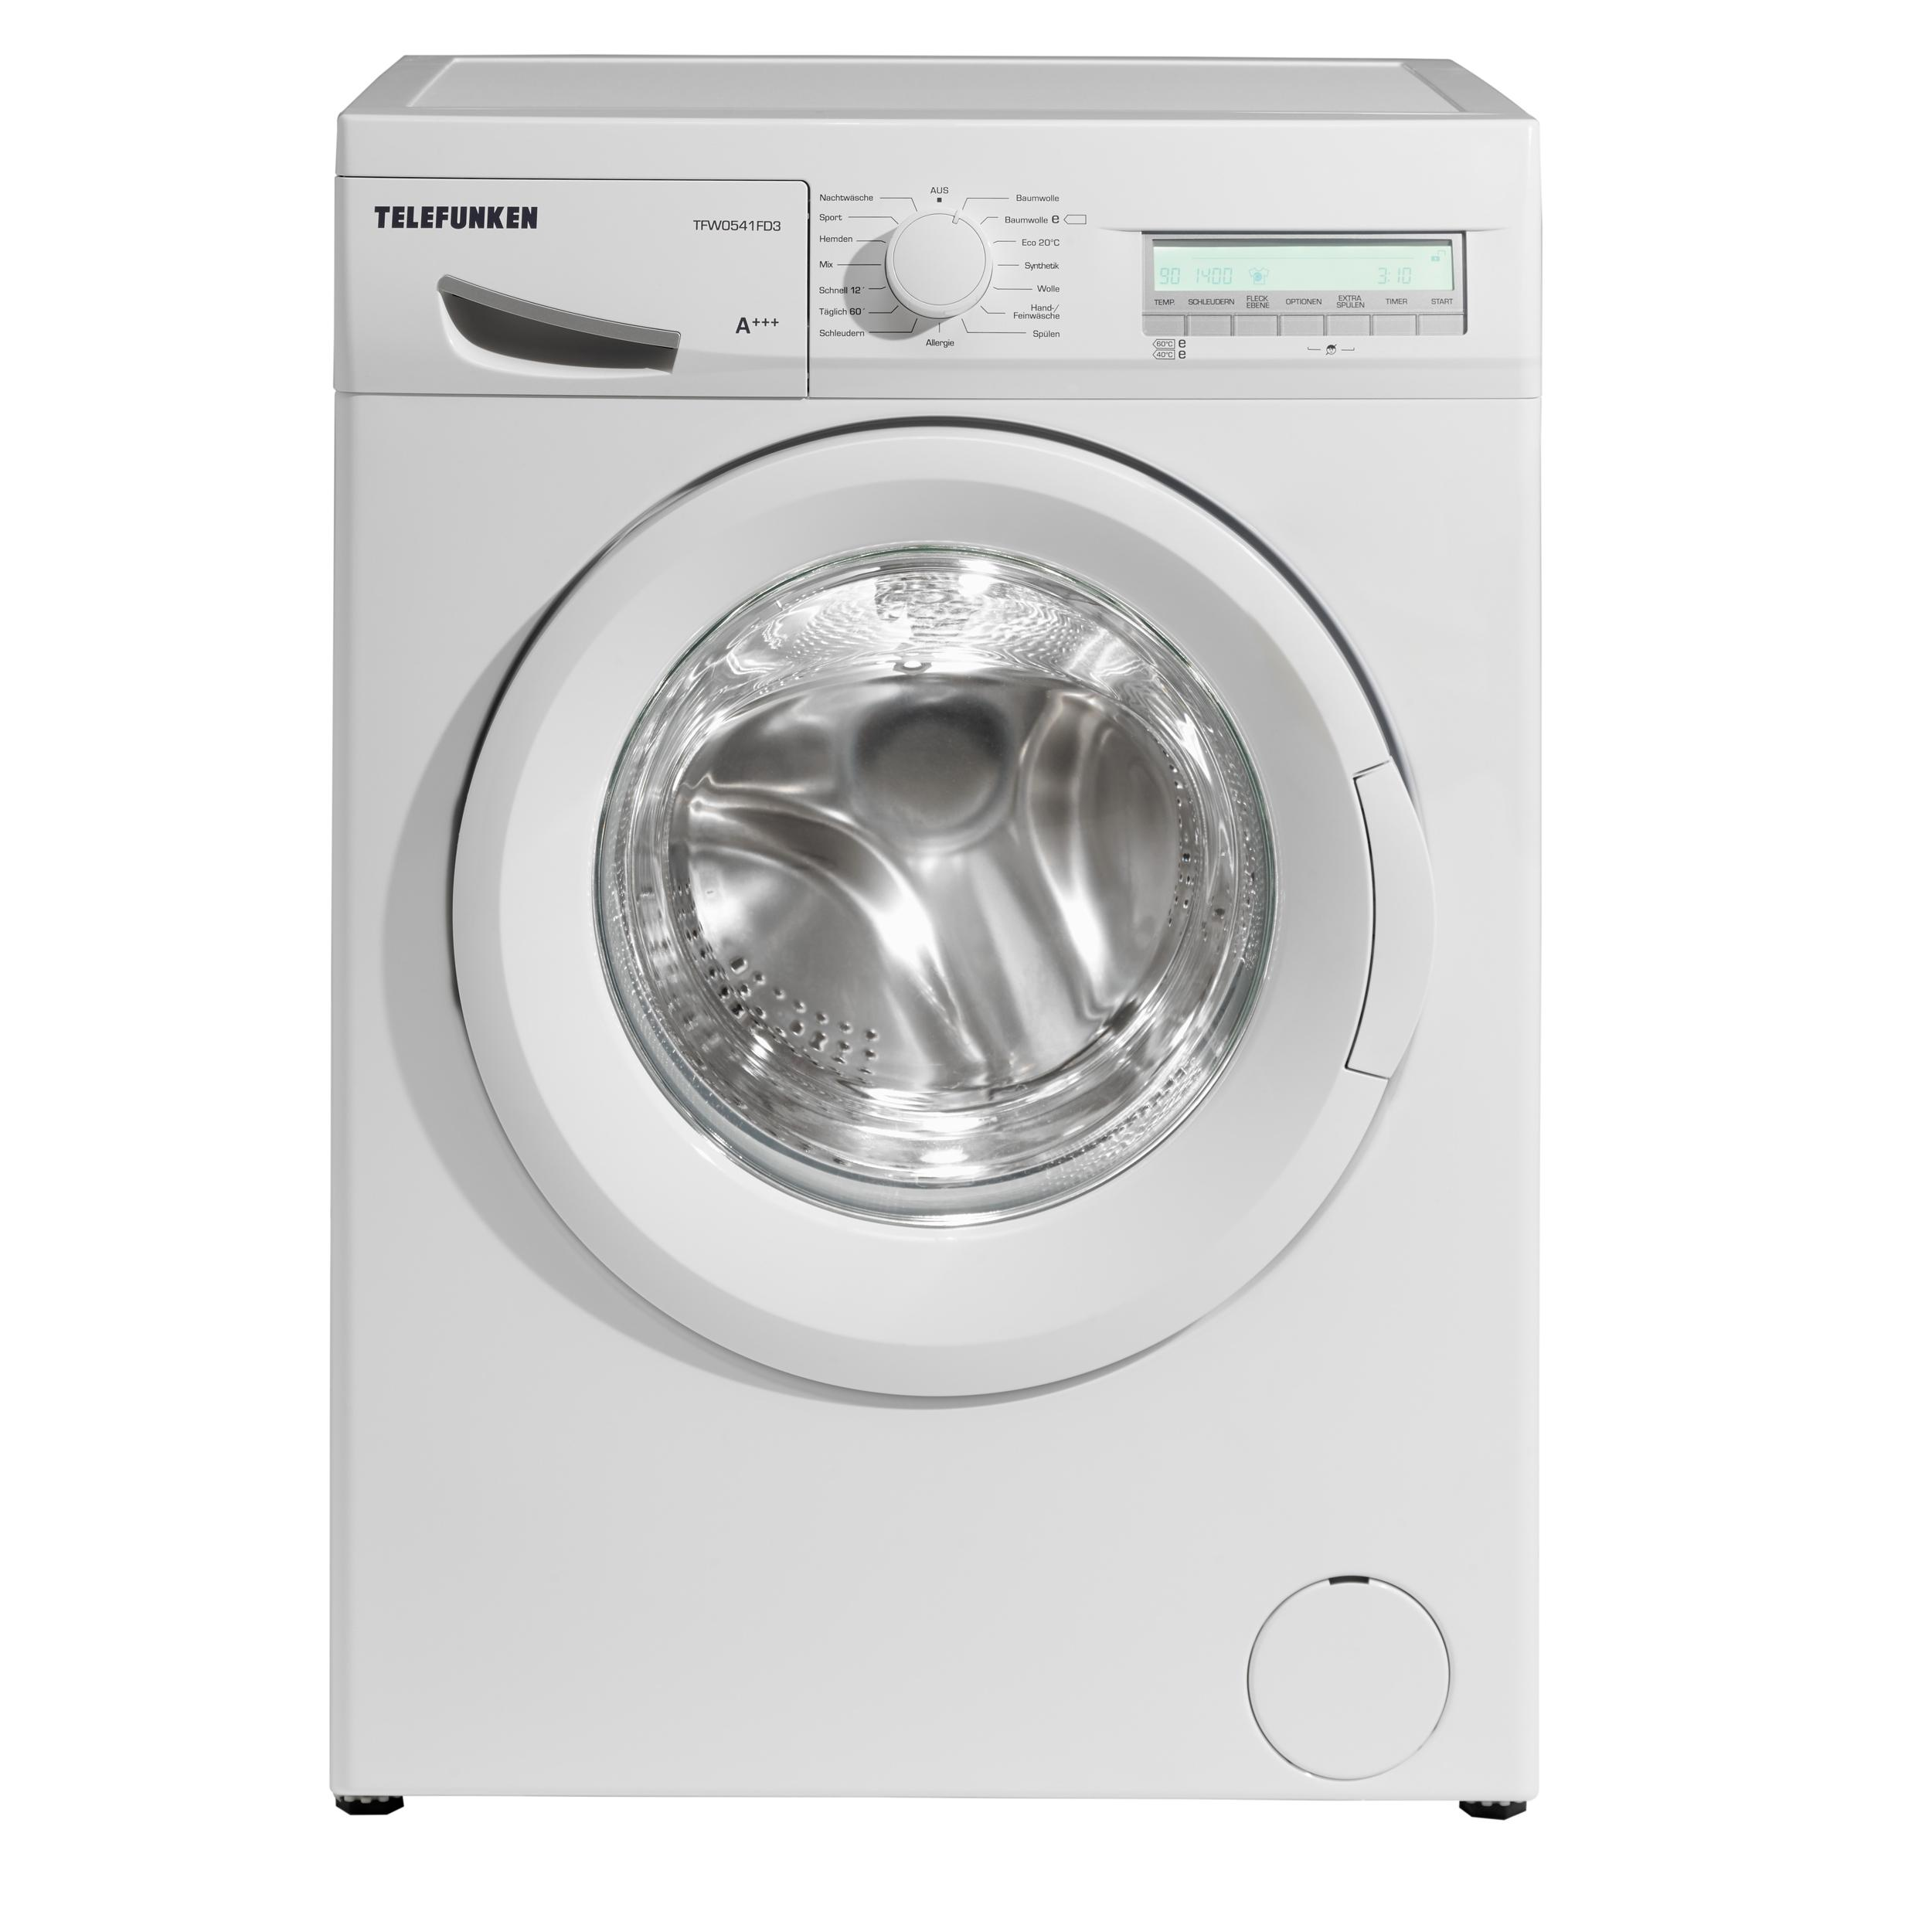 telefunken tfw0541fd3 waschmaschine fl a 162 kwh. Black Bedroom Furniture Sets. Home Design Ideas